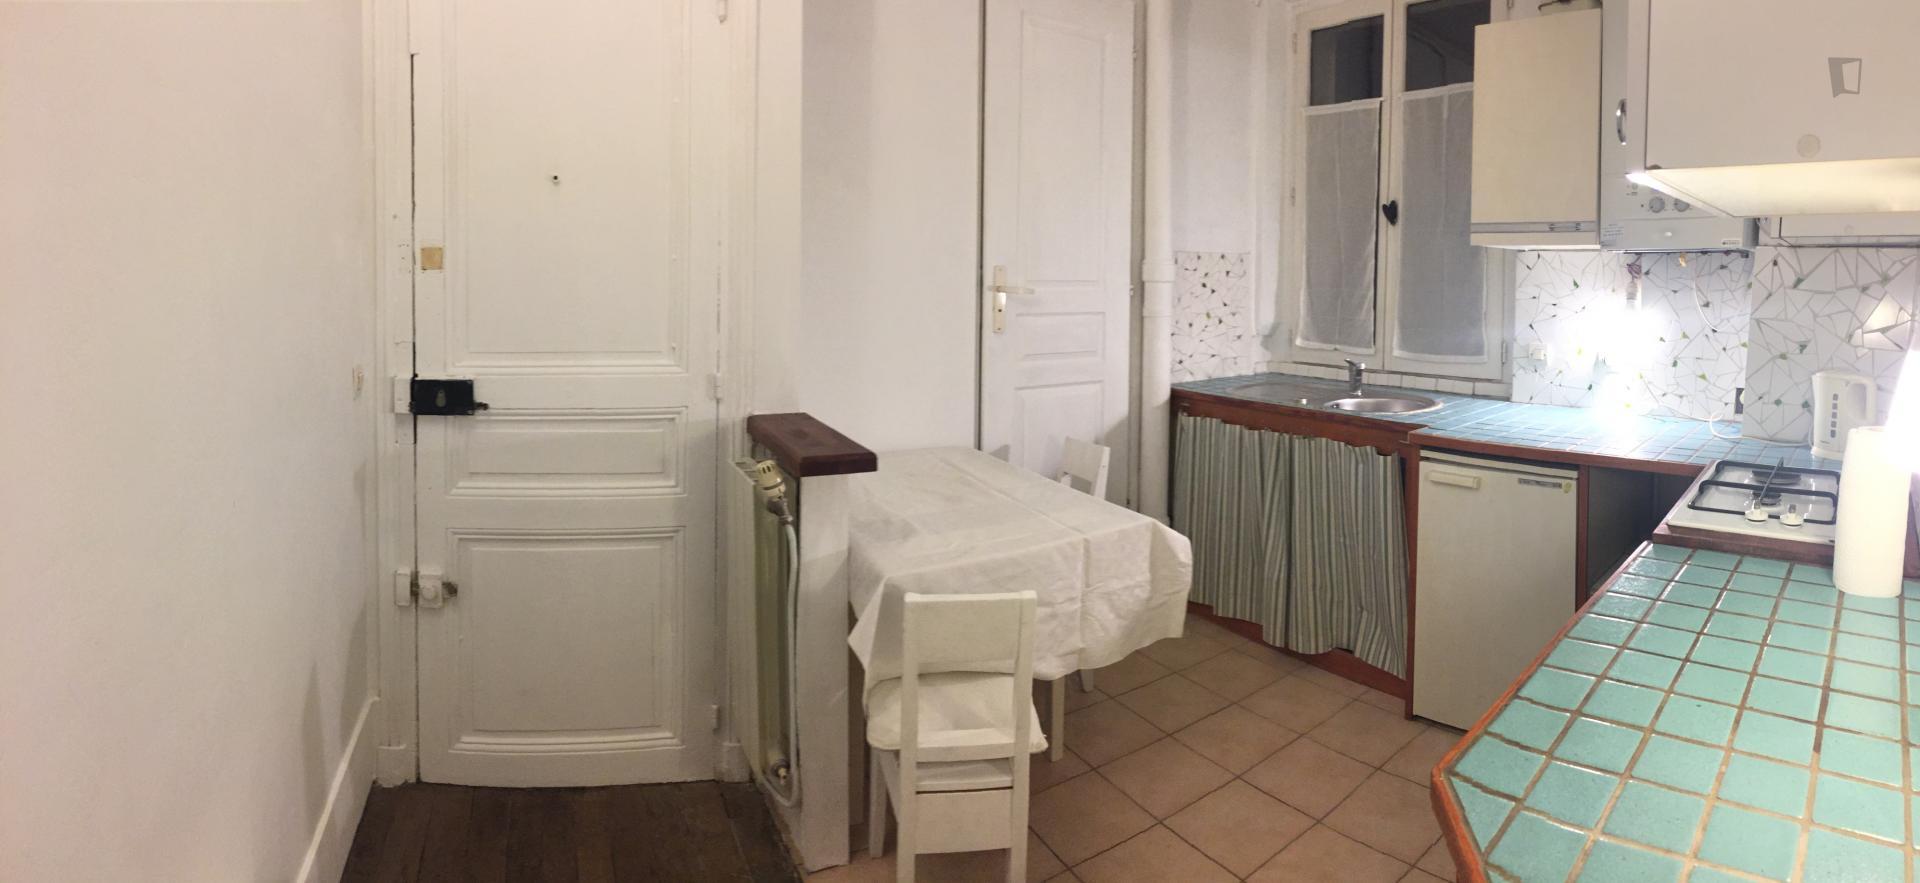 Gergovie - Apartamento listo para entrar en París